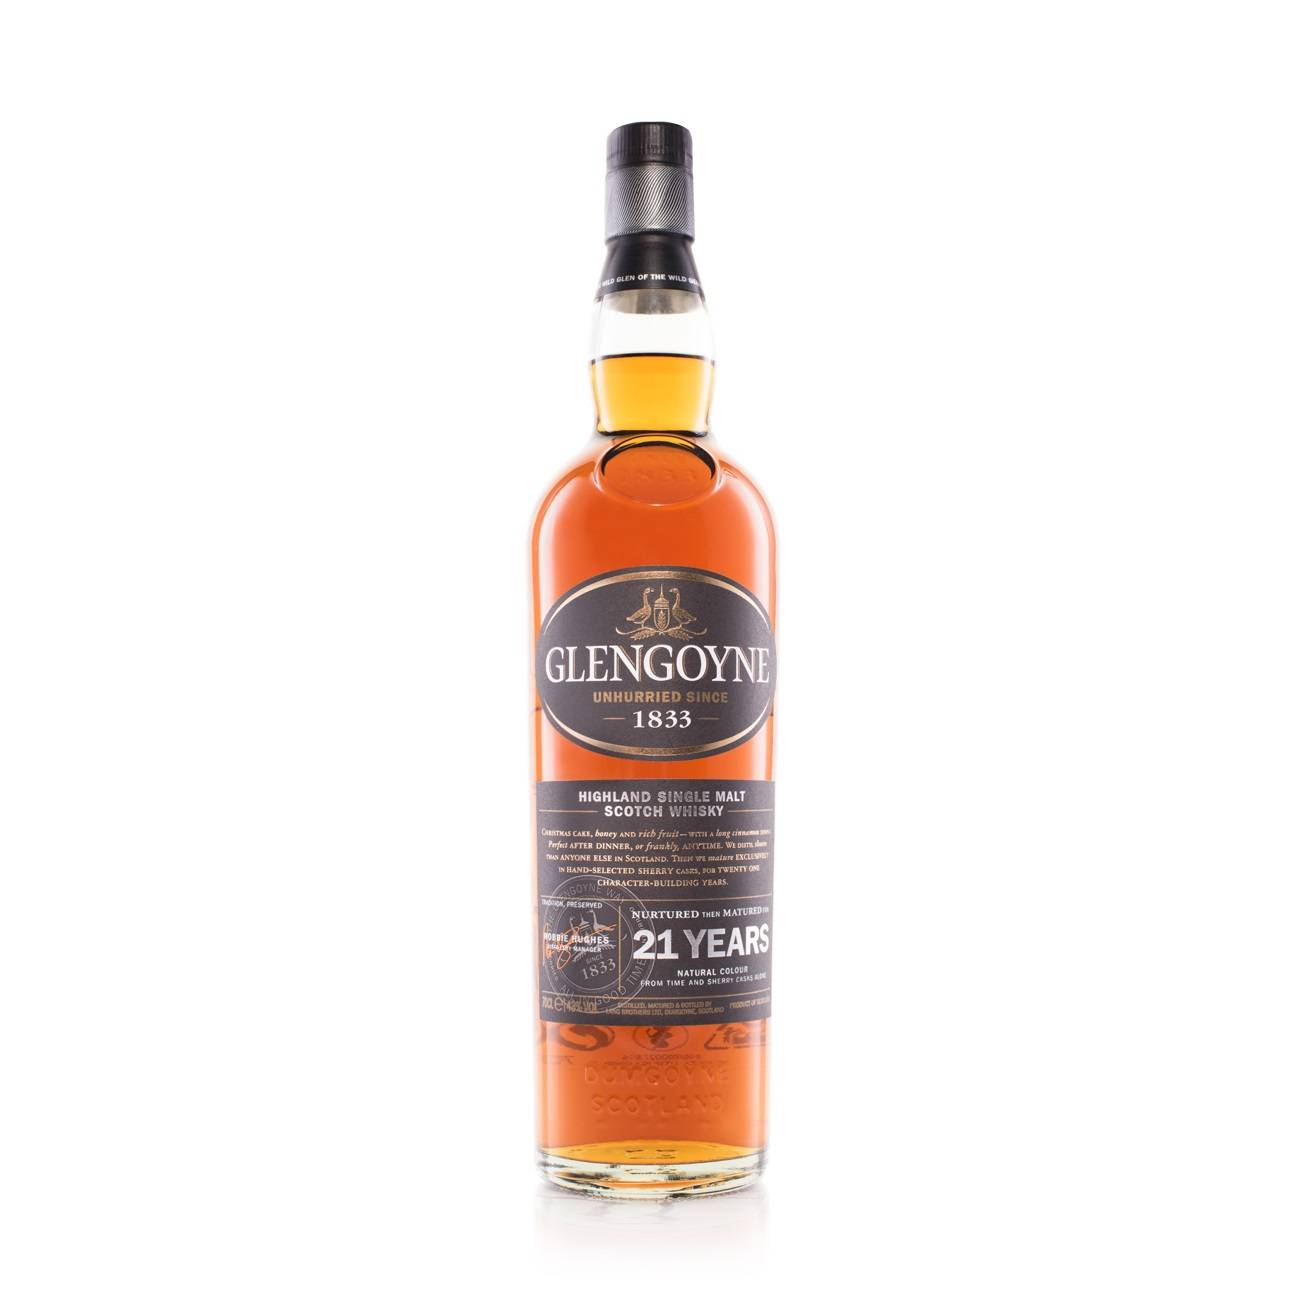 Whisky scotian, GLENGOYNE WHISKY MALT 21Y GIFTBOX 700 ML, Bowmore